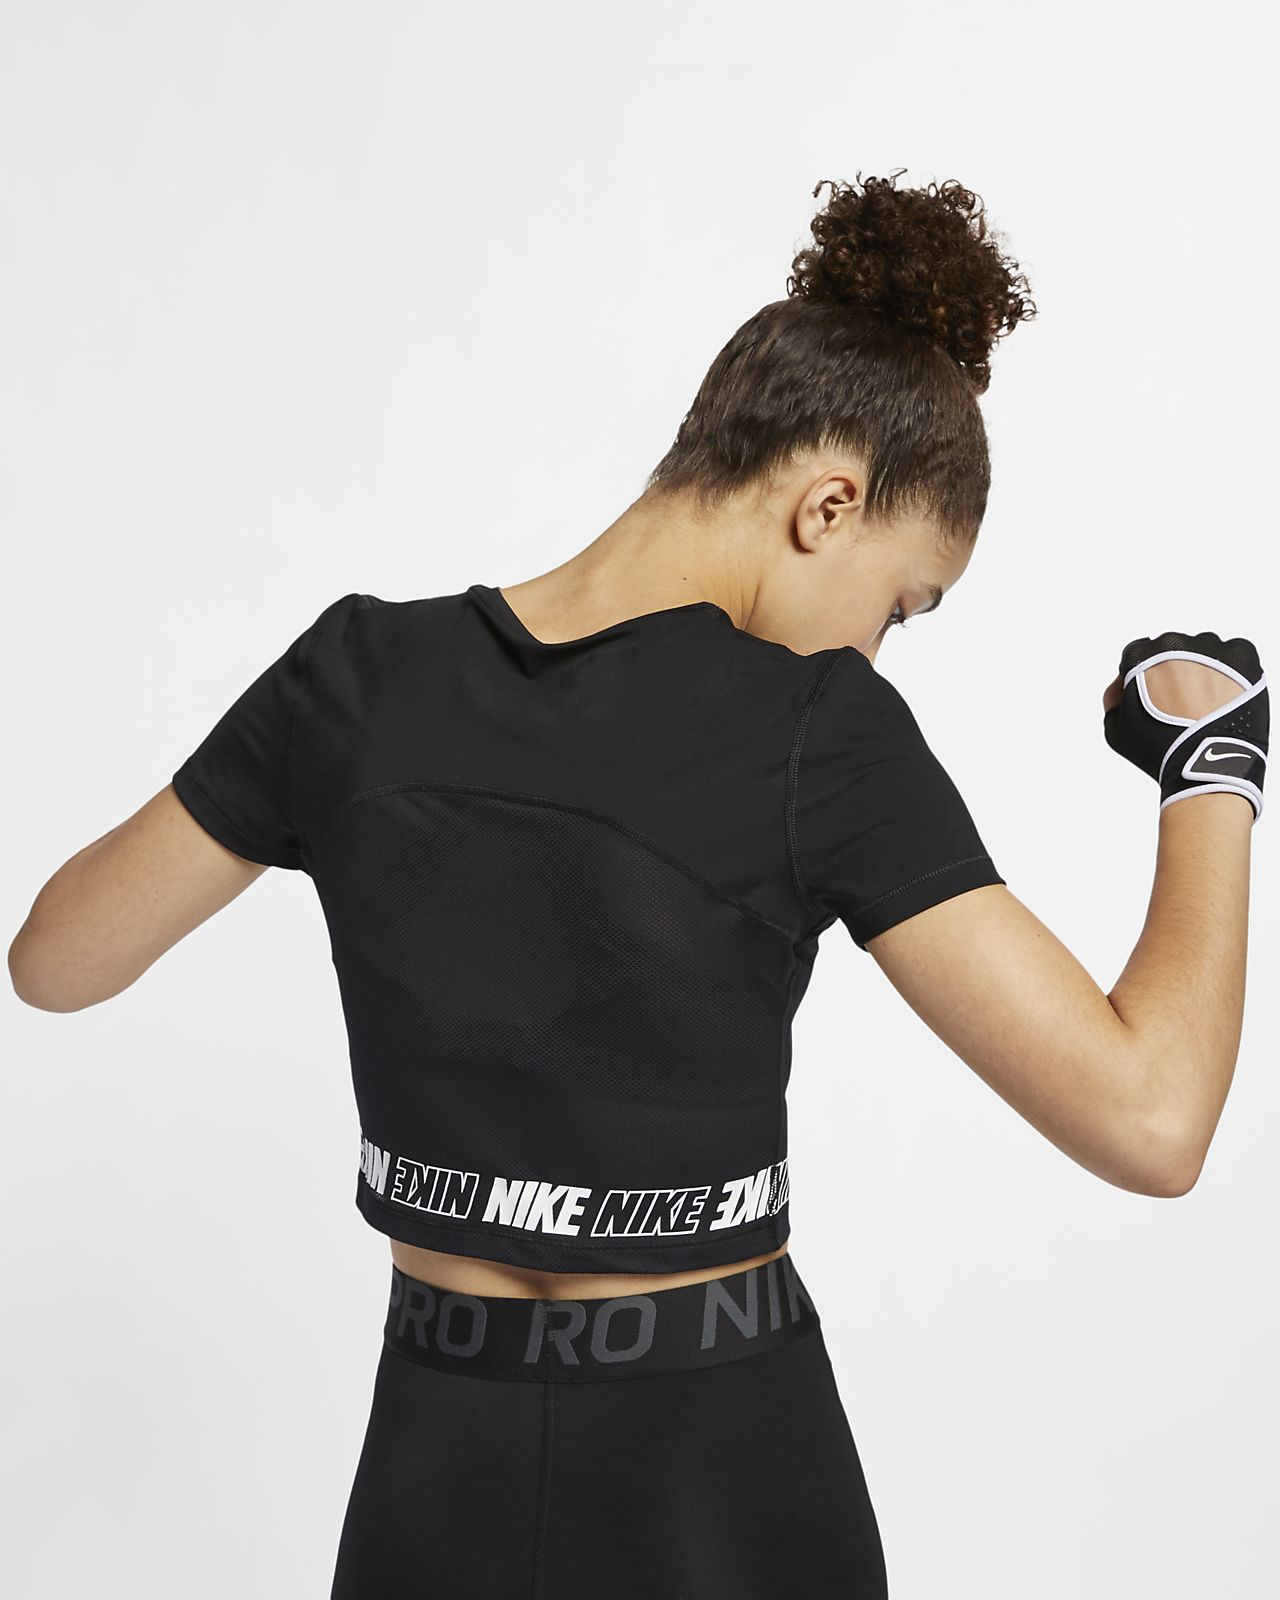 95f9c2101d473c Nike Pro Women s Short-Sleeve Crop Top. Nike.com DK